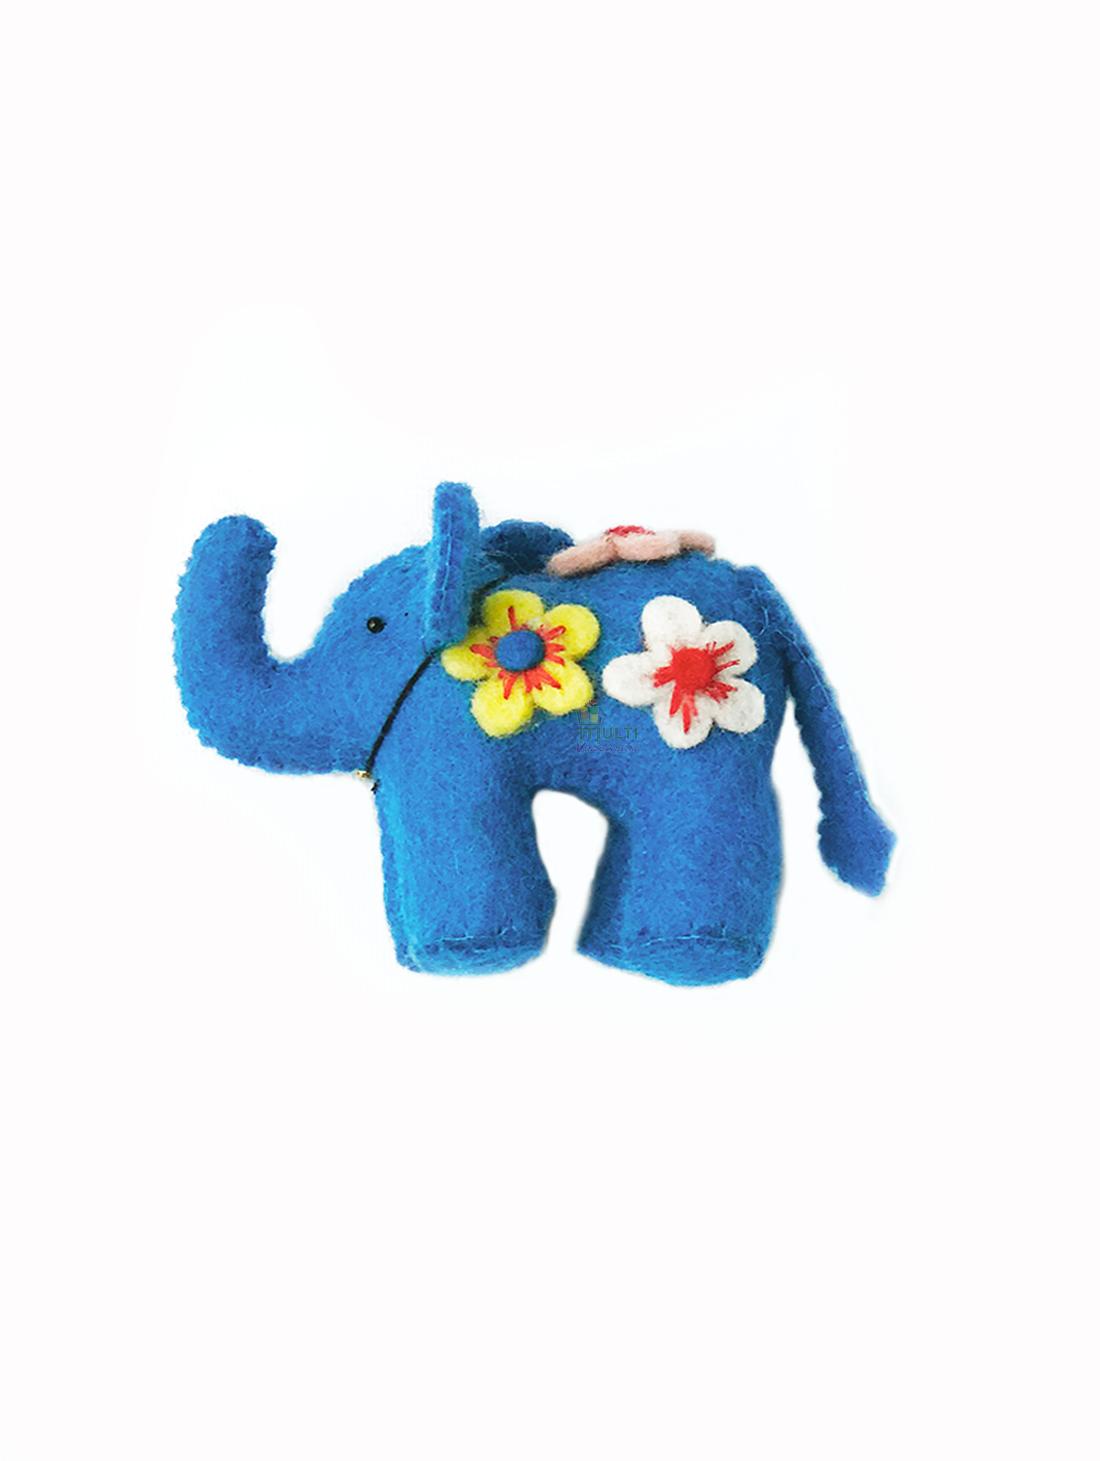 BLUE  ELEPHANT DECOR -SMALL- M.V.K.S.F-174A